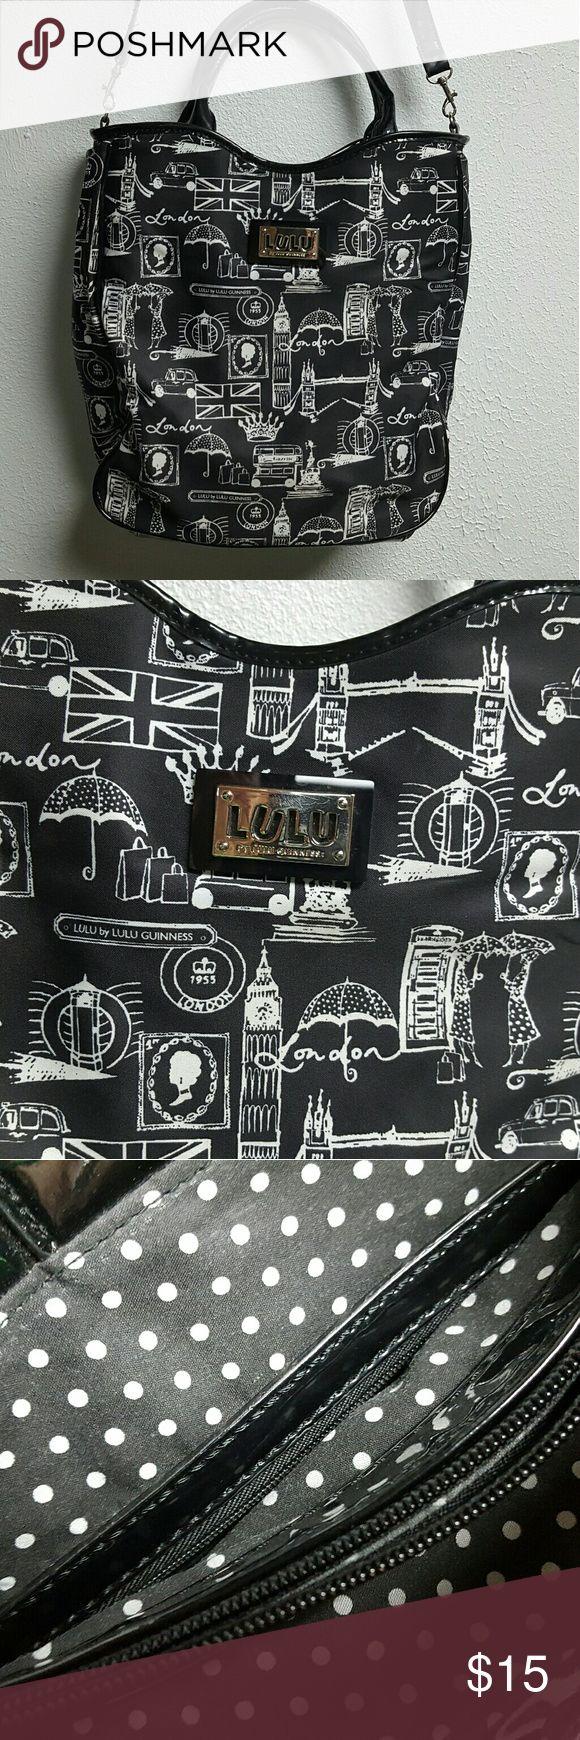 LULU BAG Wymsical black and white print Lulu Bags Shoulder Bags